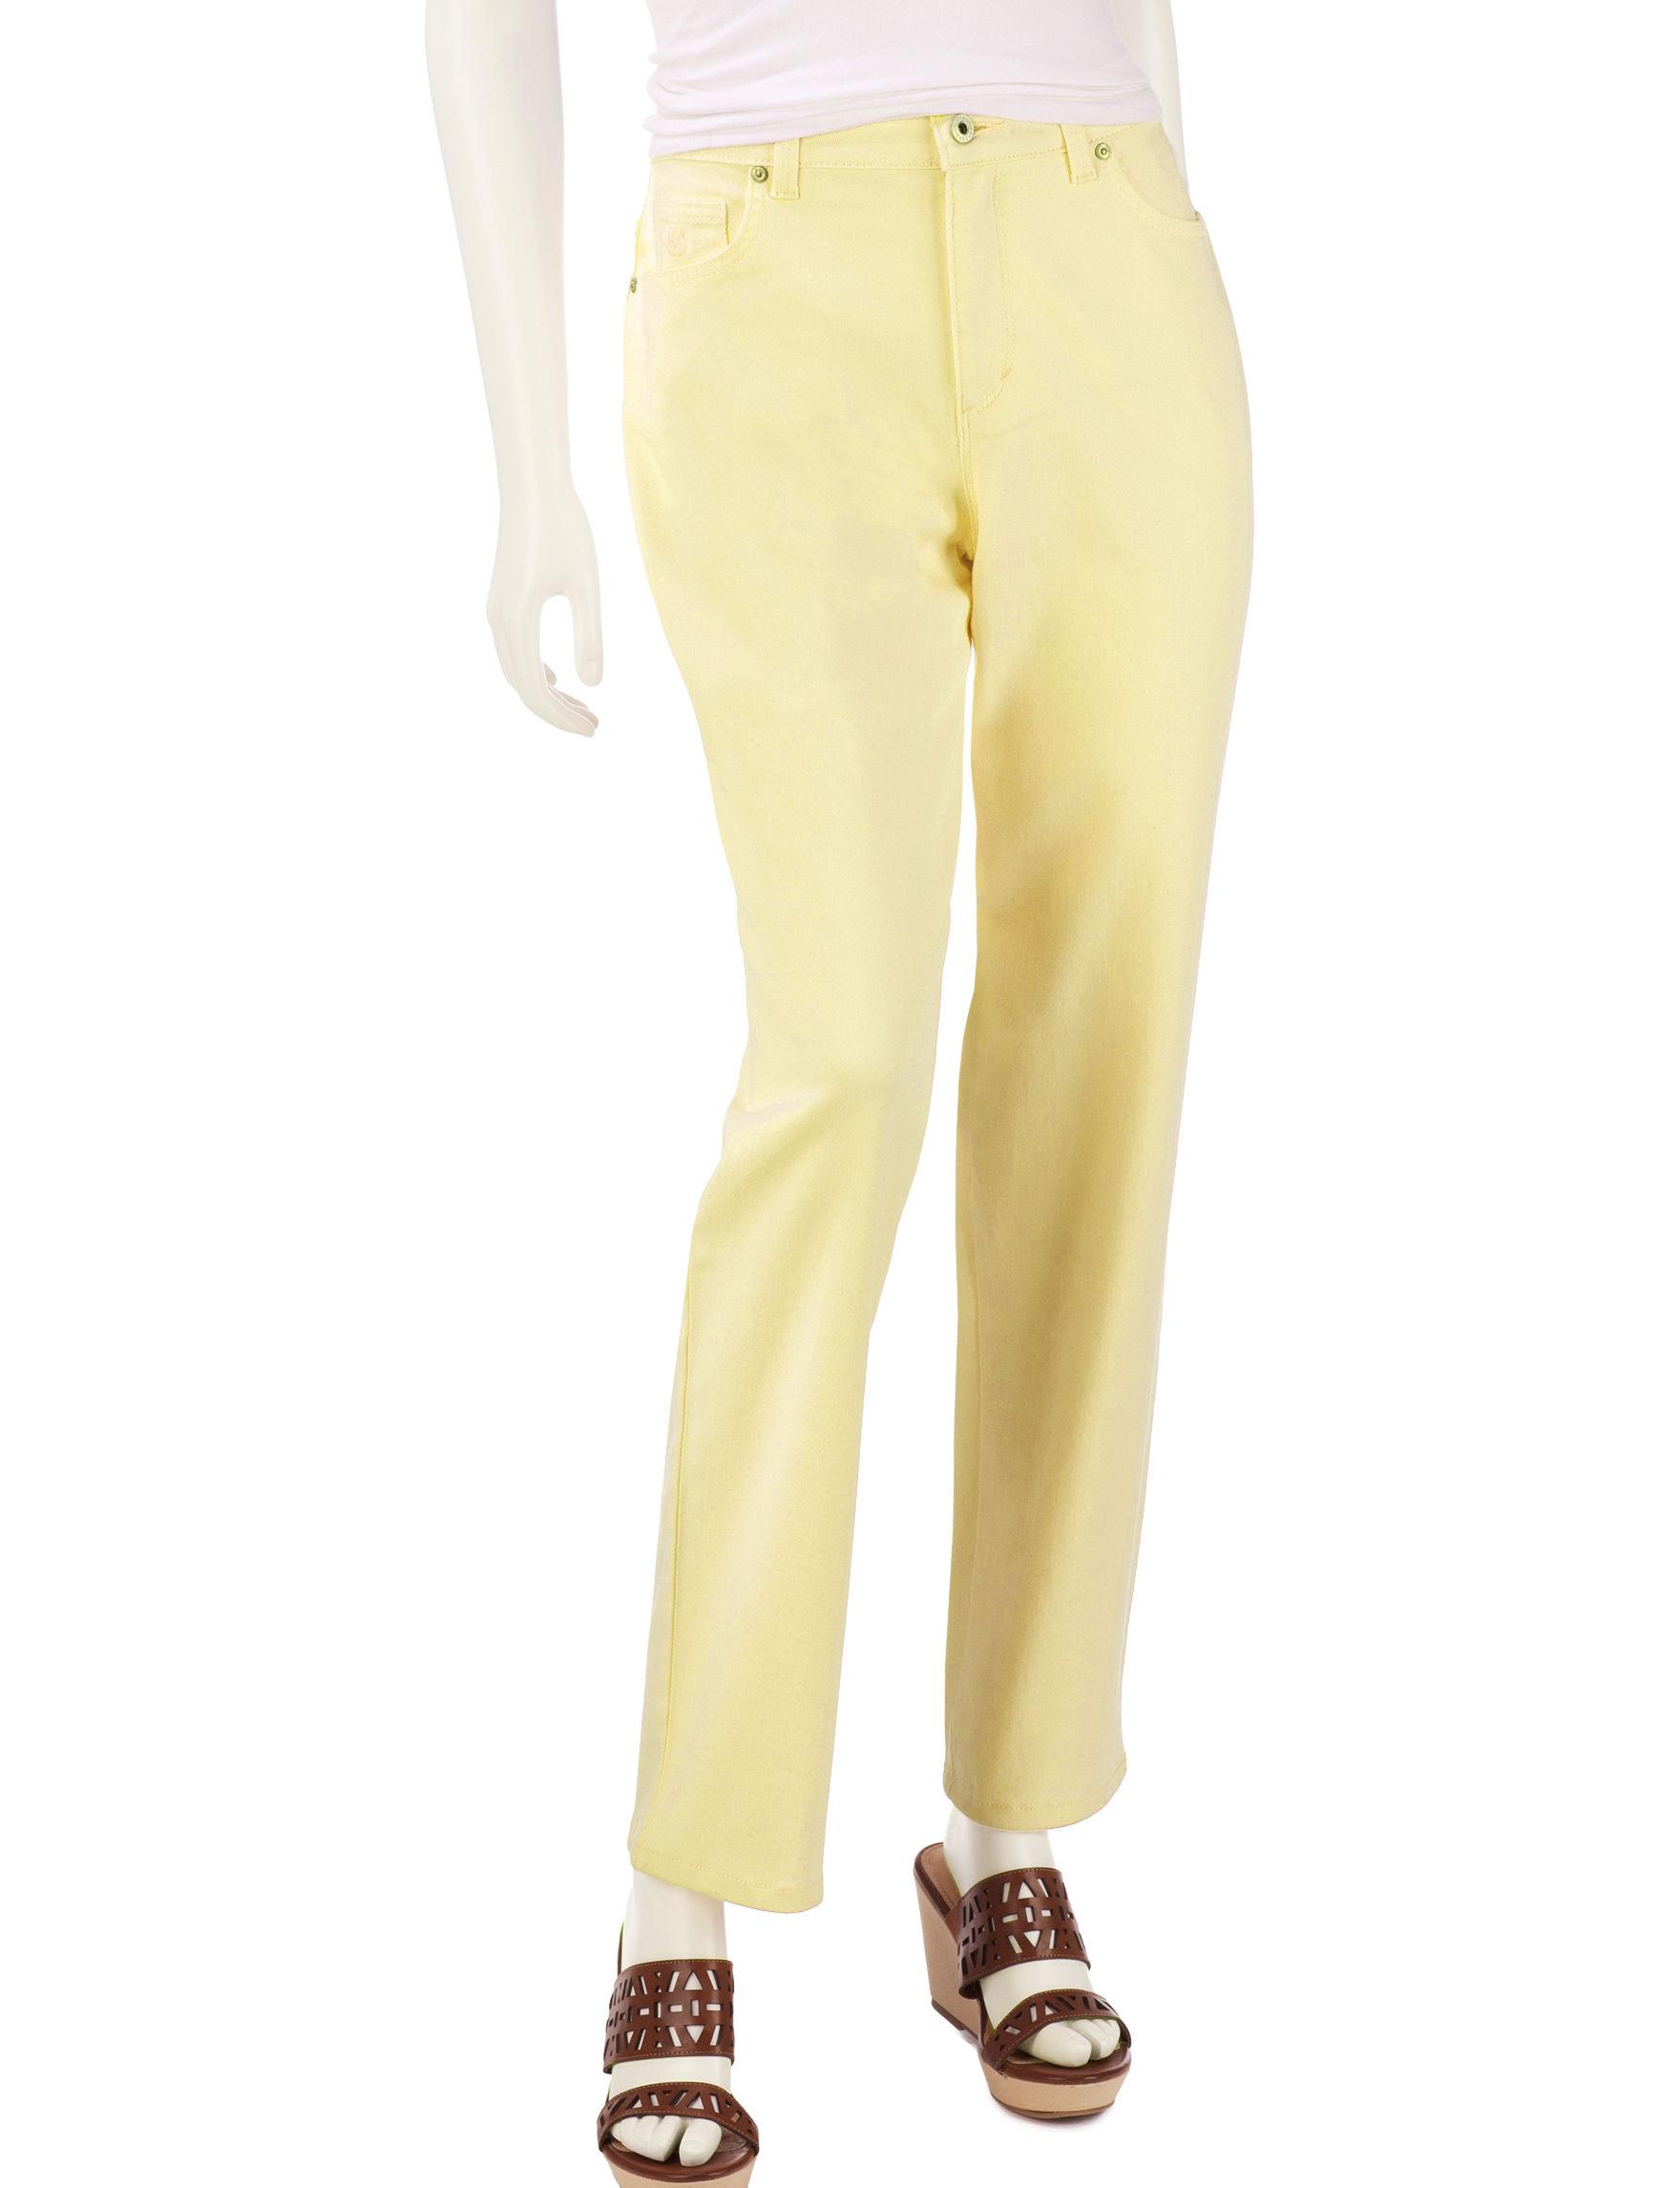 Gloria Vanderbilt Yellow